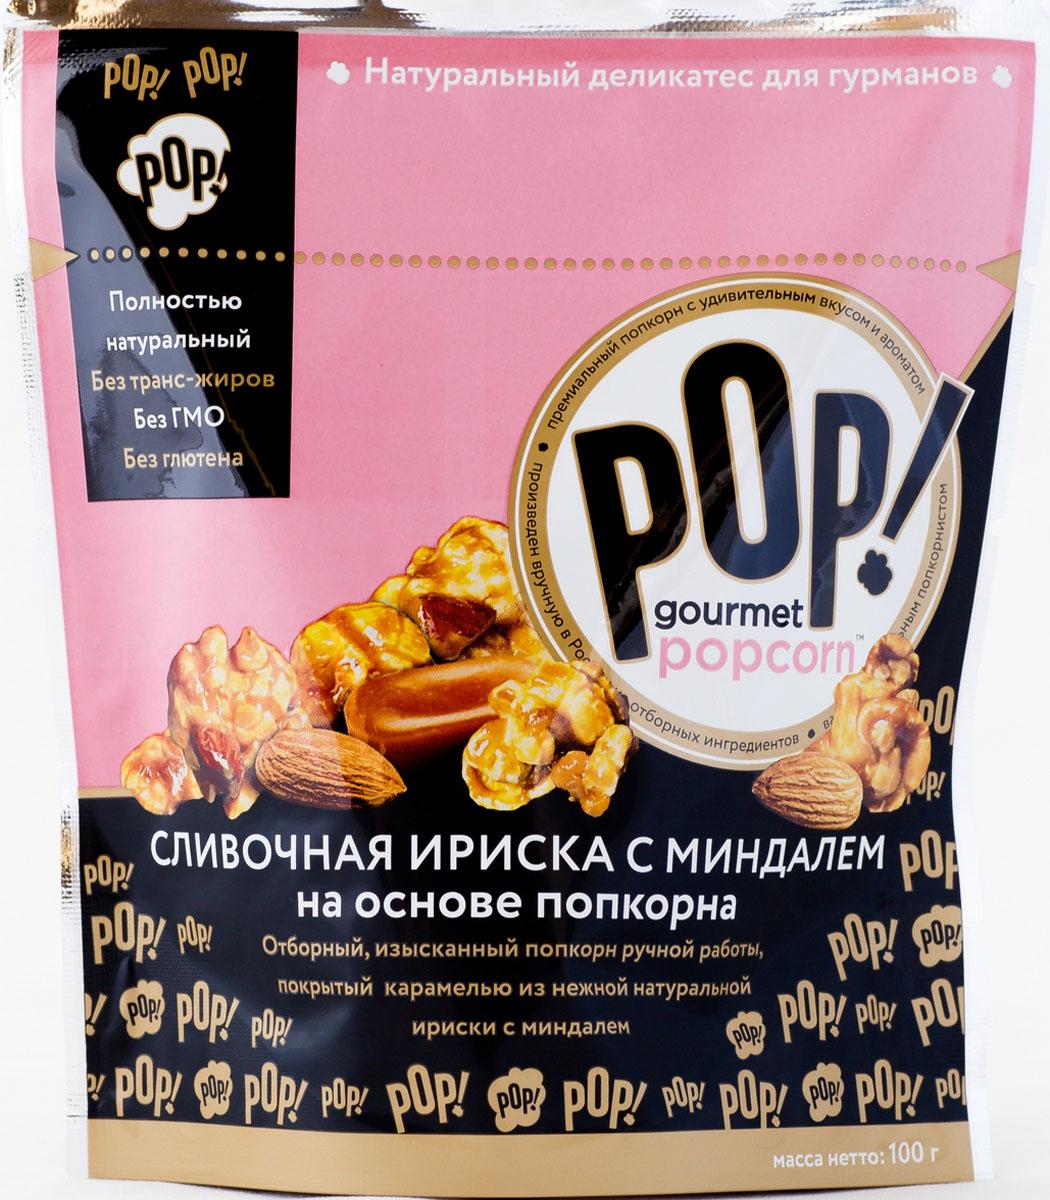 POP! Gourmet Popcorn сливочная ириска с миндалем на основе попкорна, 100 г pop secret pop secret light butter flavor microwavable popcorn 3 pk pack of 24